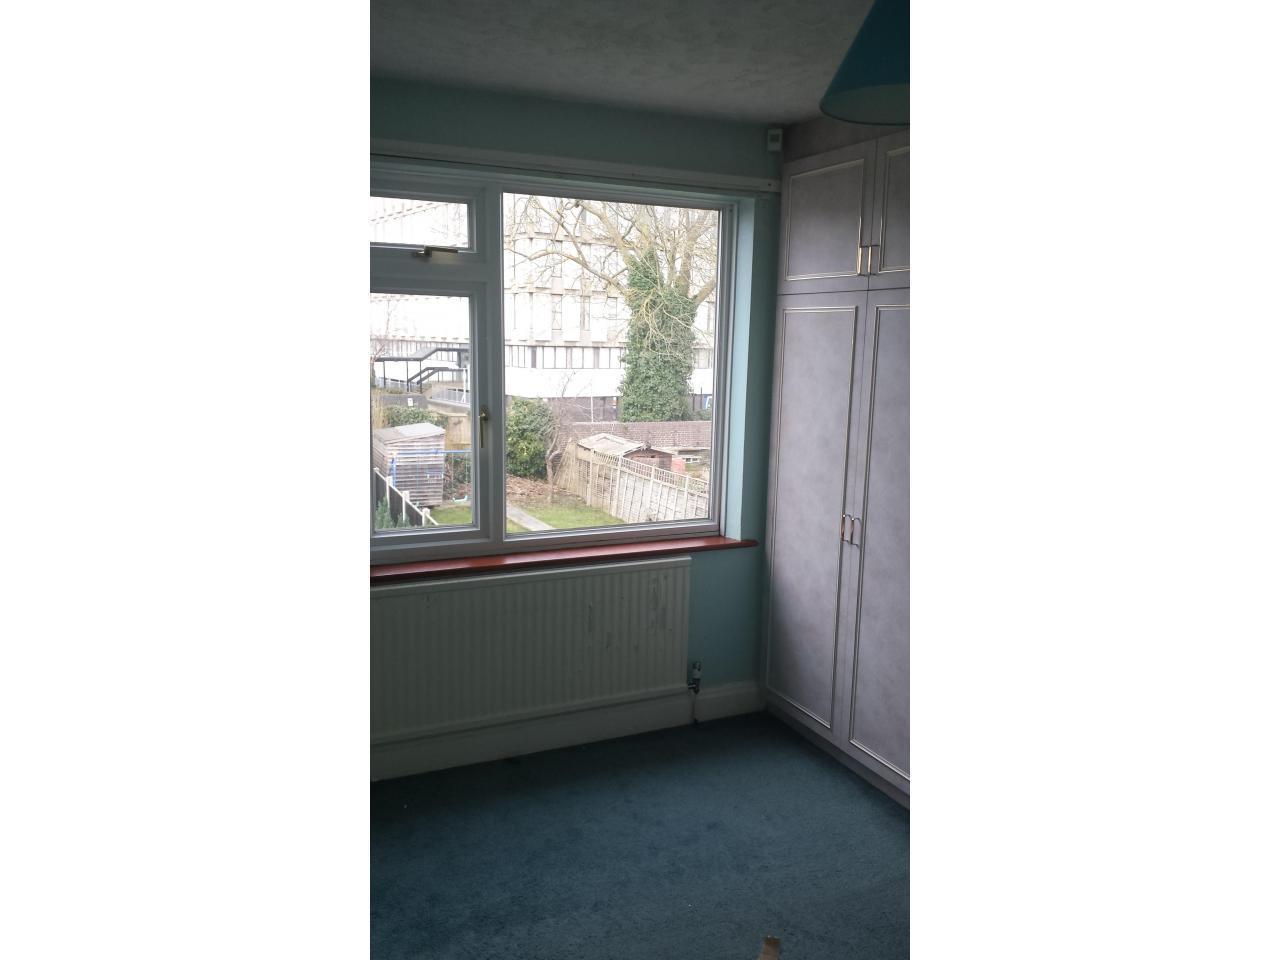 Сингл и Дабл комнаты в аренду на Neasden / Sudbury Hill / Harrow / Greenford. - 7